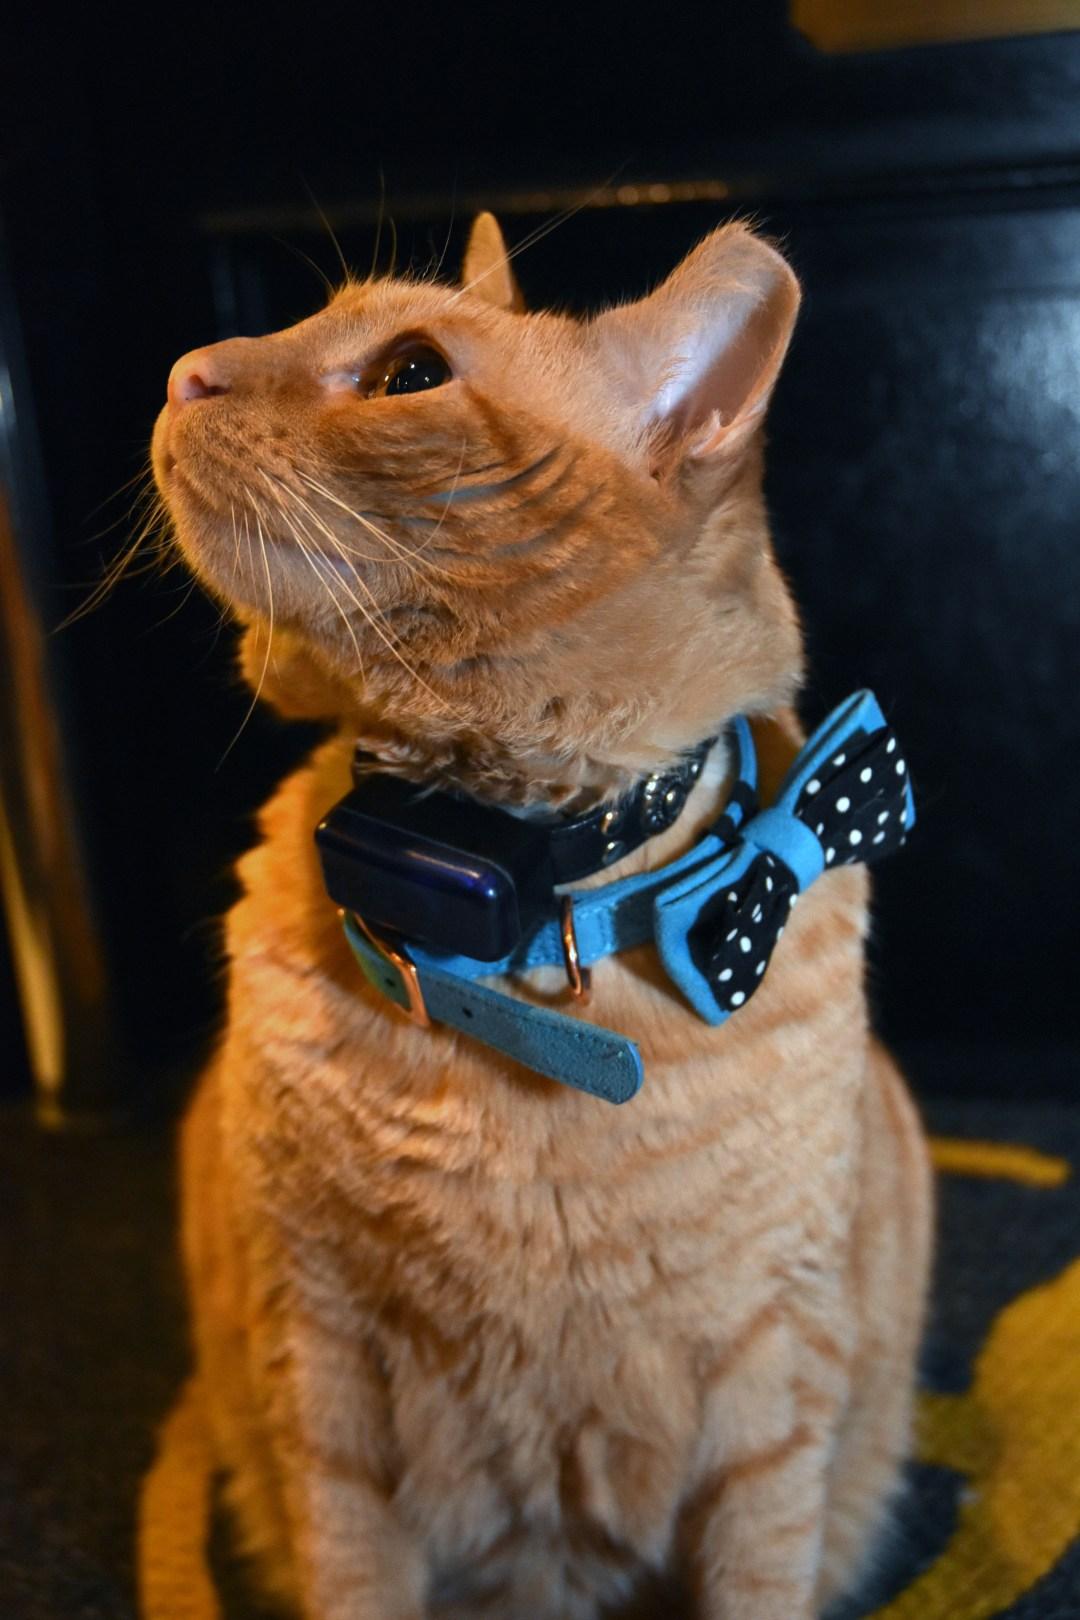 The Algonquin Cat Fashion Show 2019, with host Hamlet, The Algonquin Cat